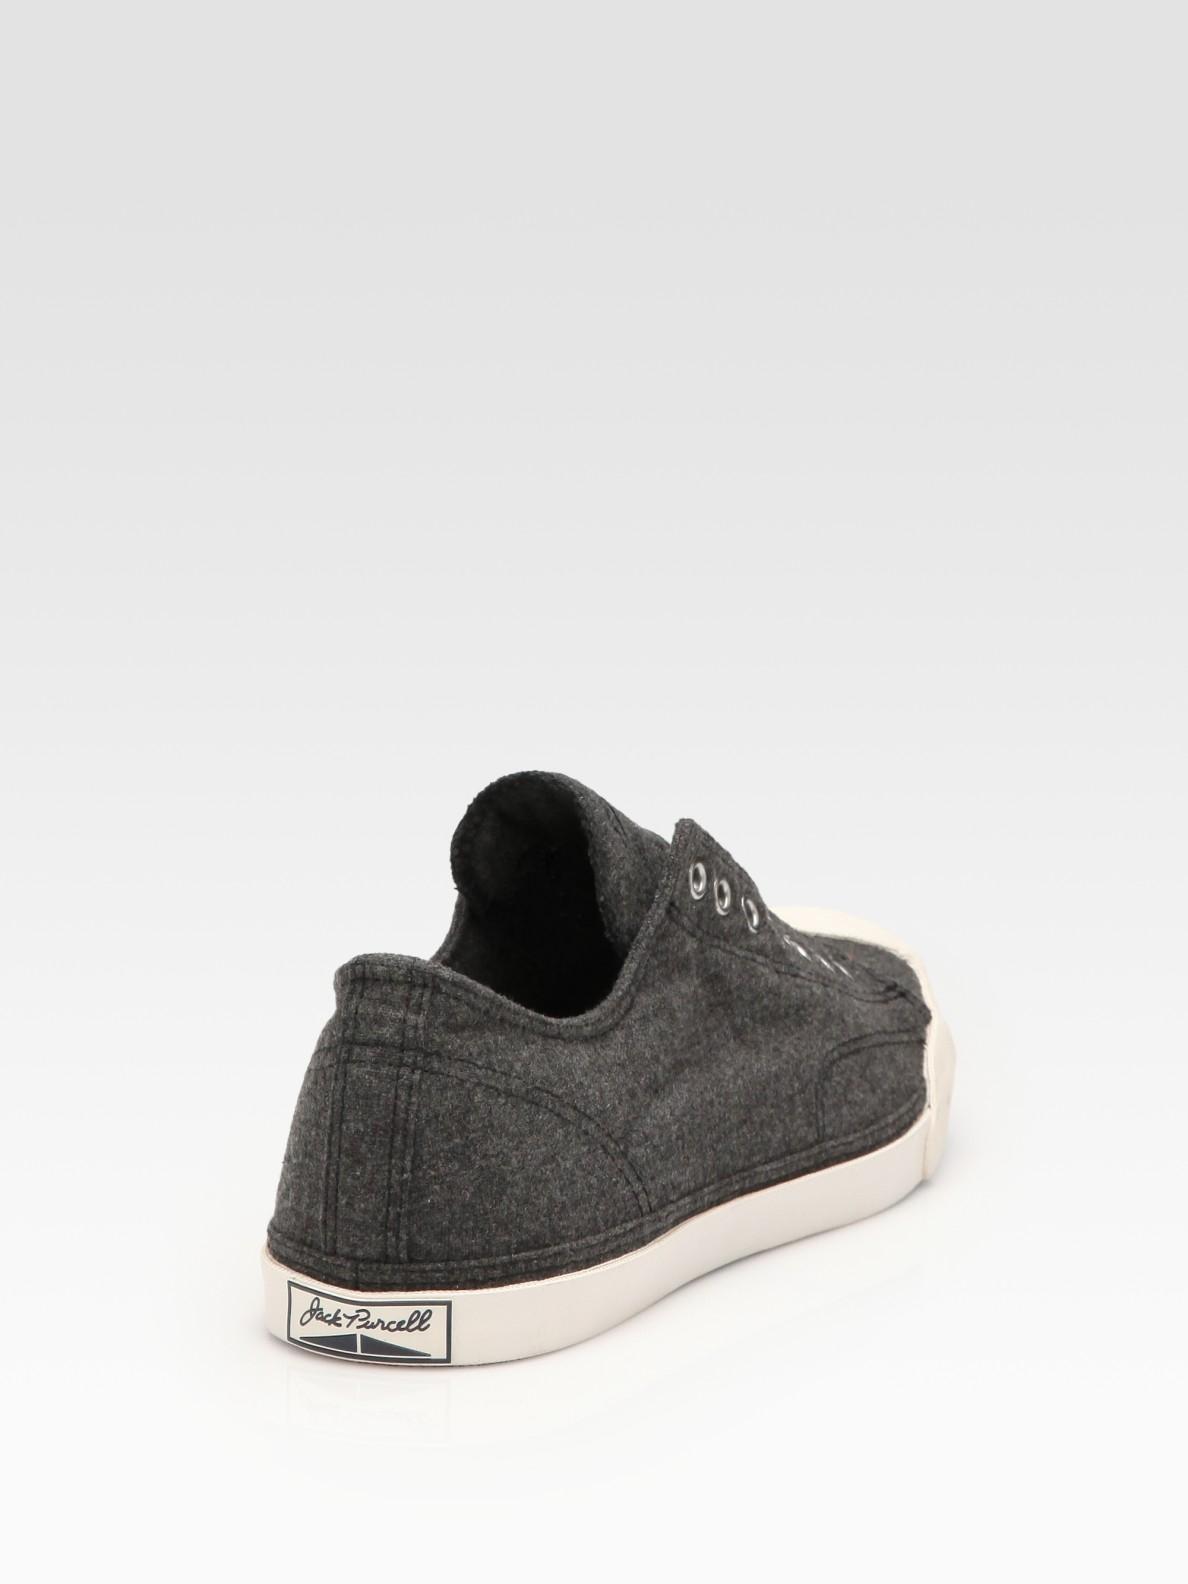 fbc015122ba3 Lyst - Converse Jack Purcell Wool Sneakers in Black